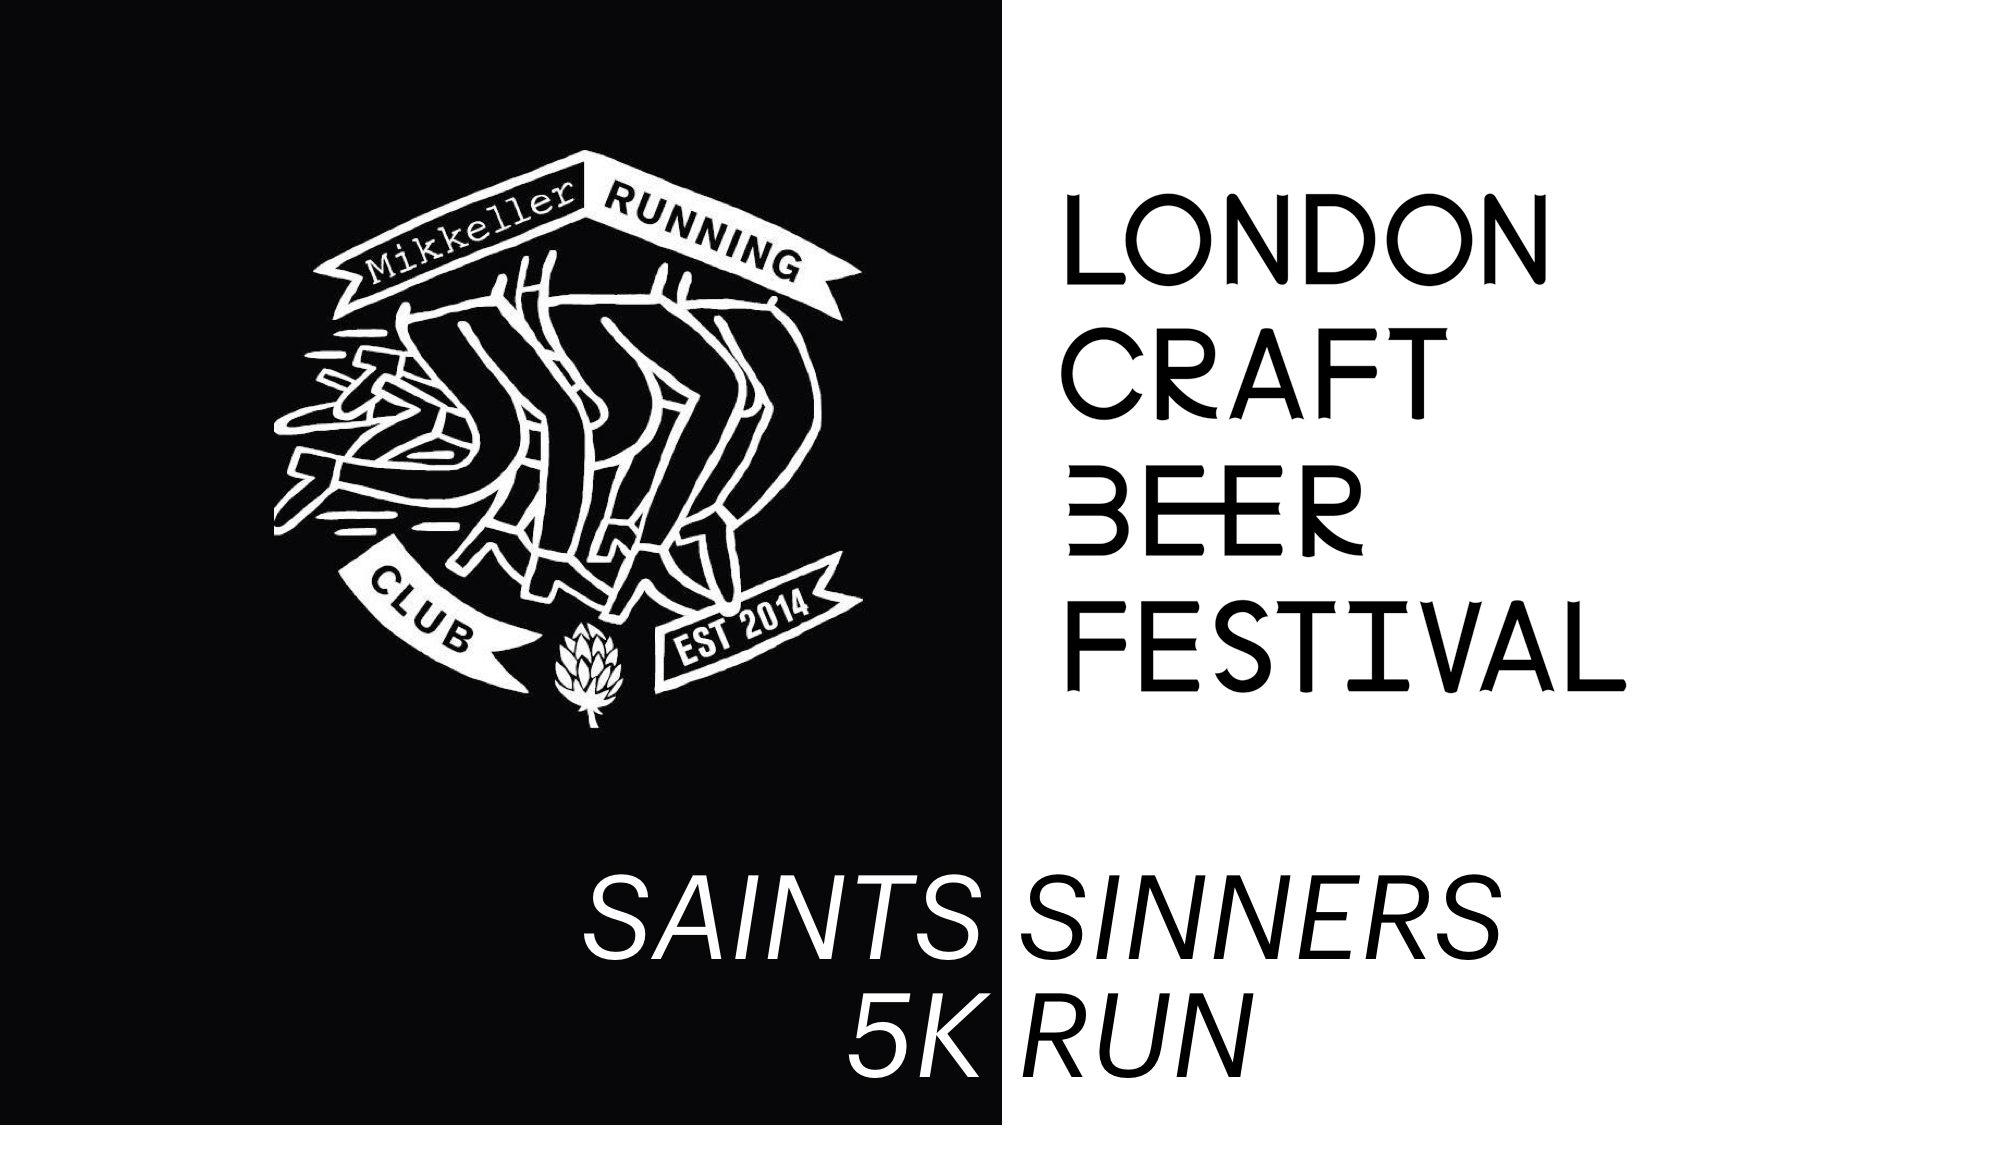 LCBF x Mikkeller Running Club: Saints and Sinners Run